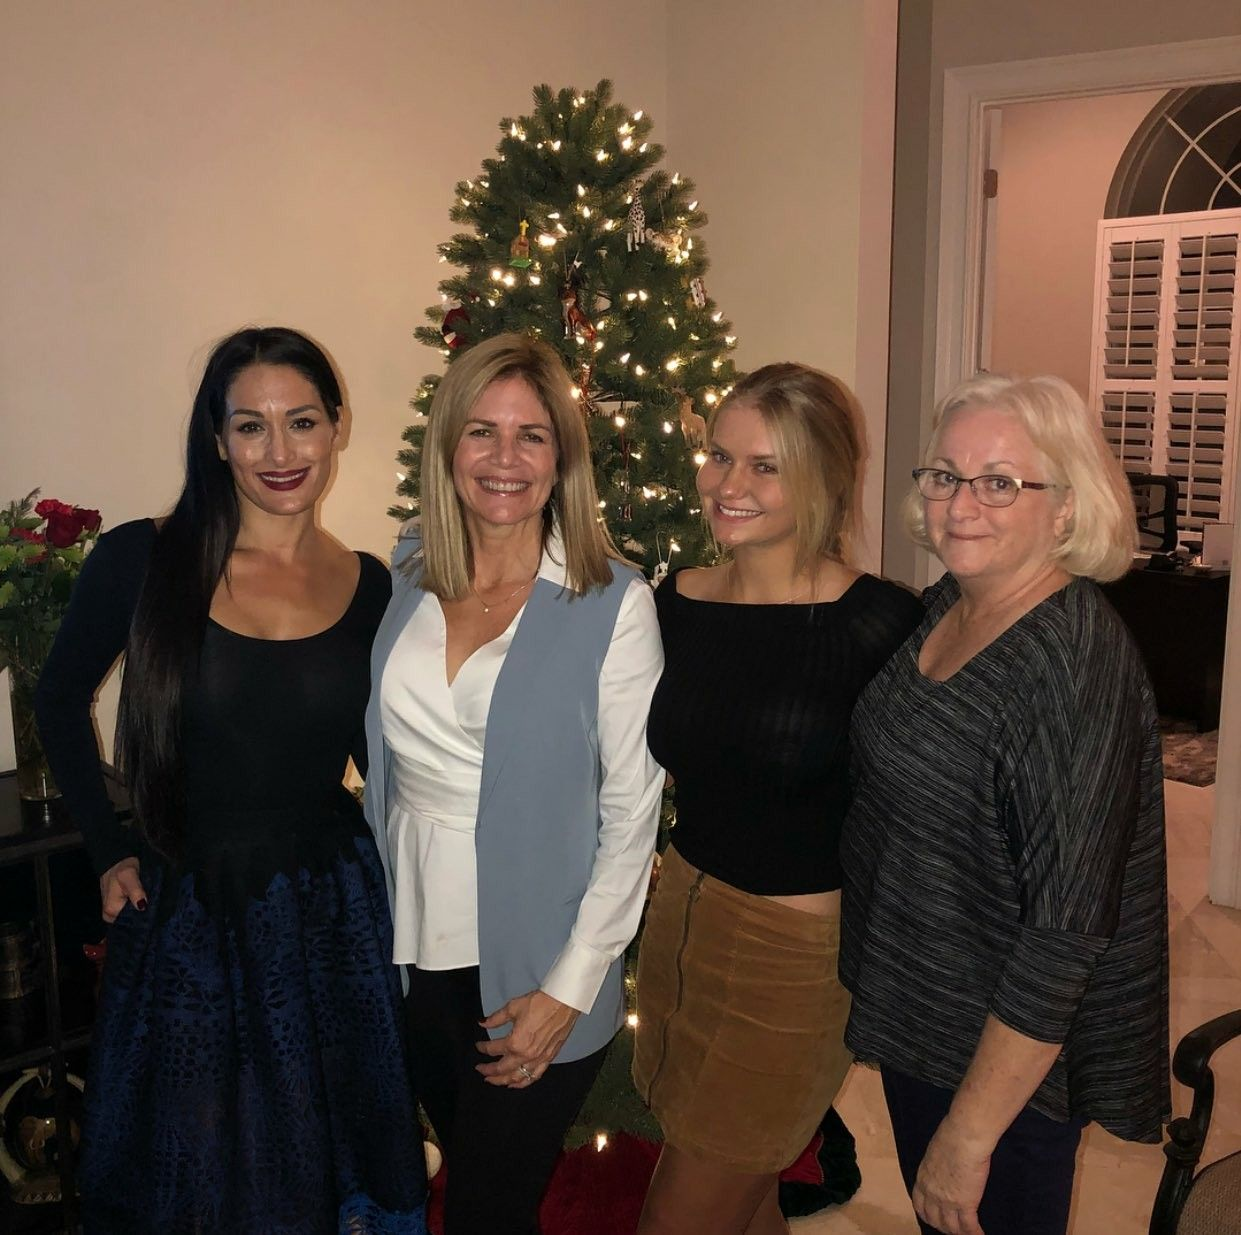 Nikki Bella, Kathy Colace, John Laurinaitis Daughter, Family | The ...